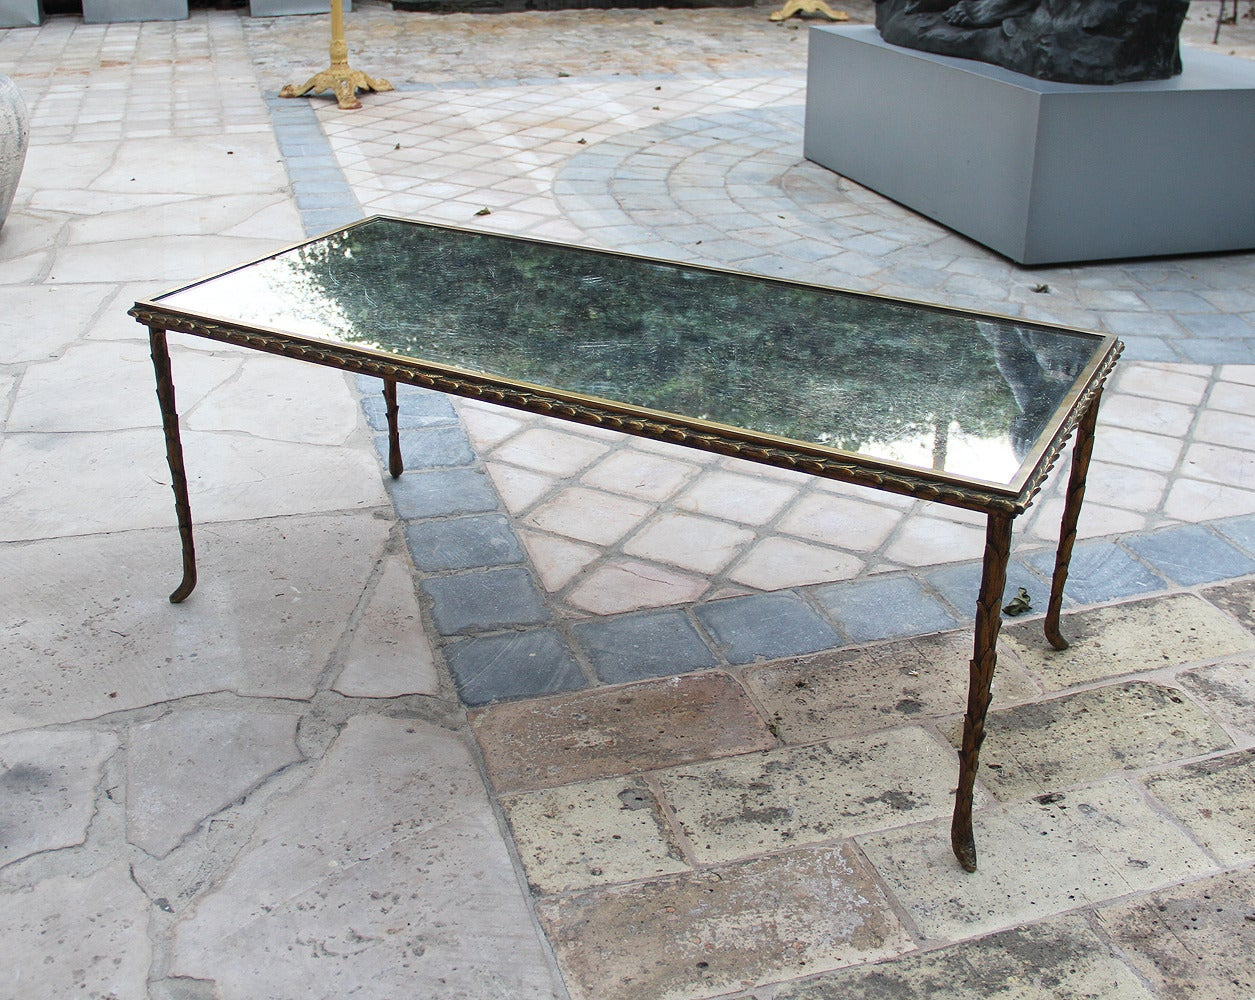 rare bronze table by maison bagu s 1950 for sale at 1stdibs. Black Bedroom Furniture Sets. Home Design Ideas